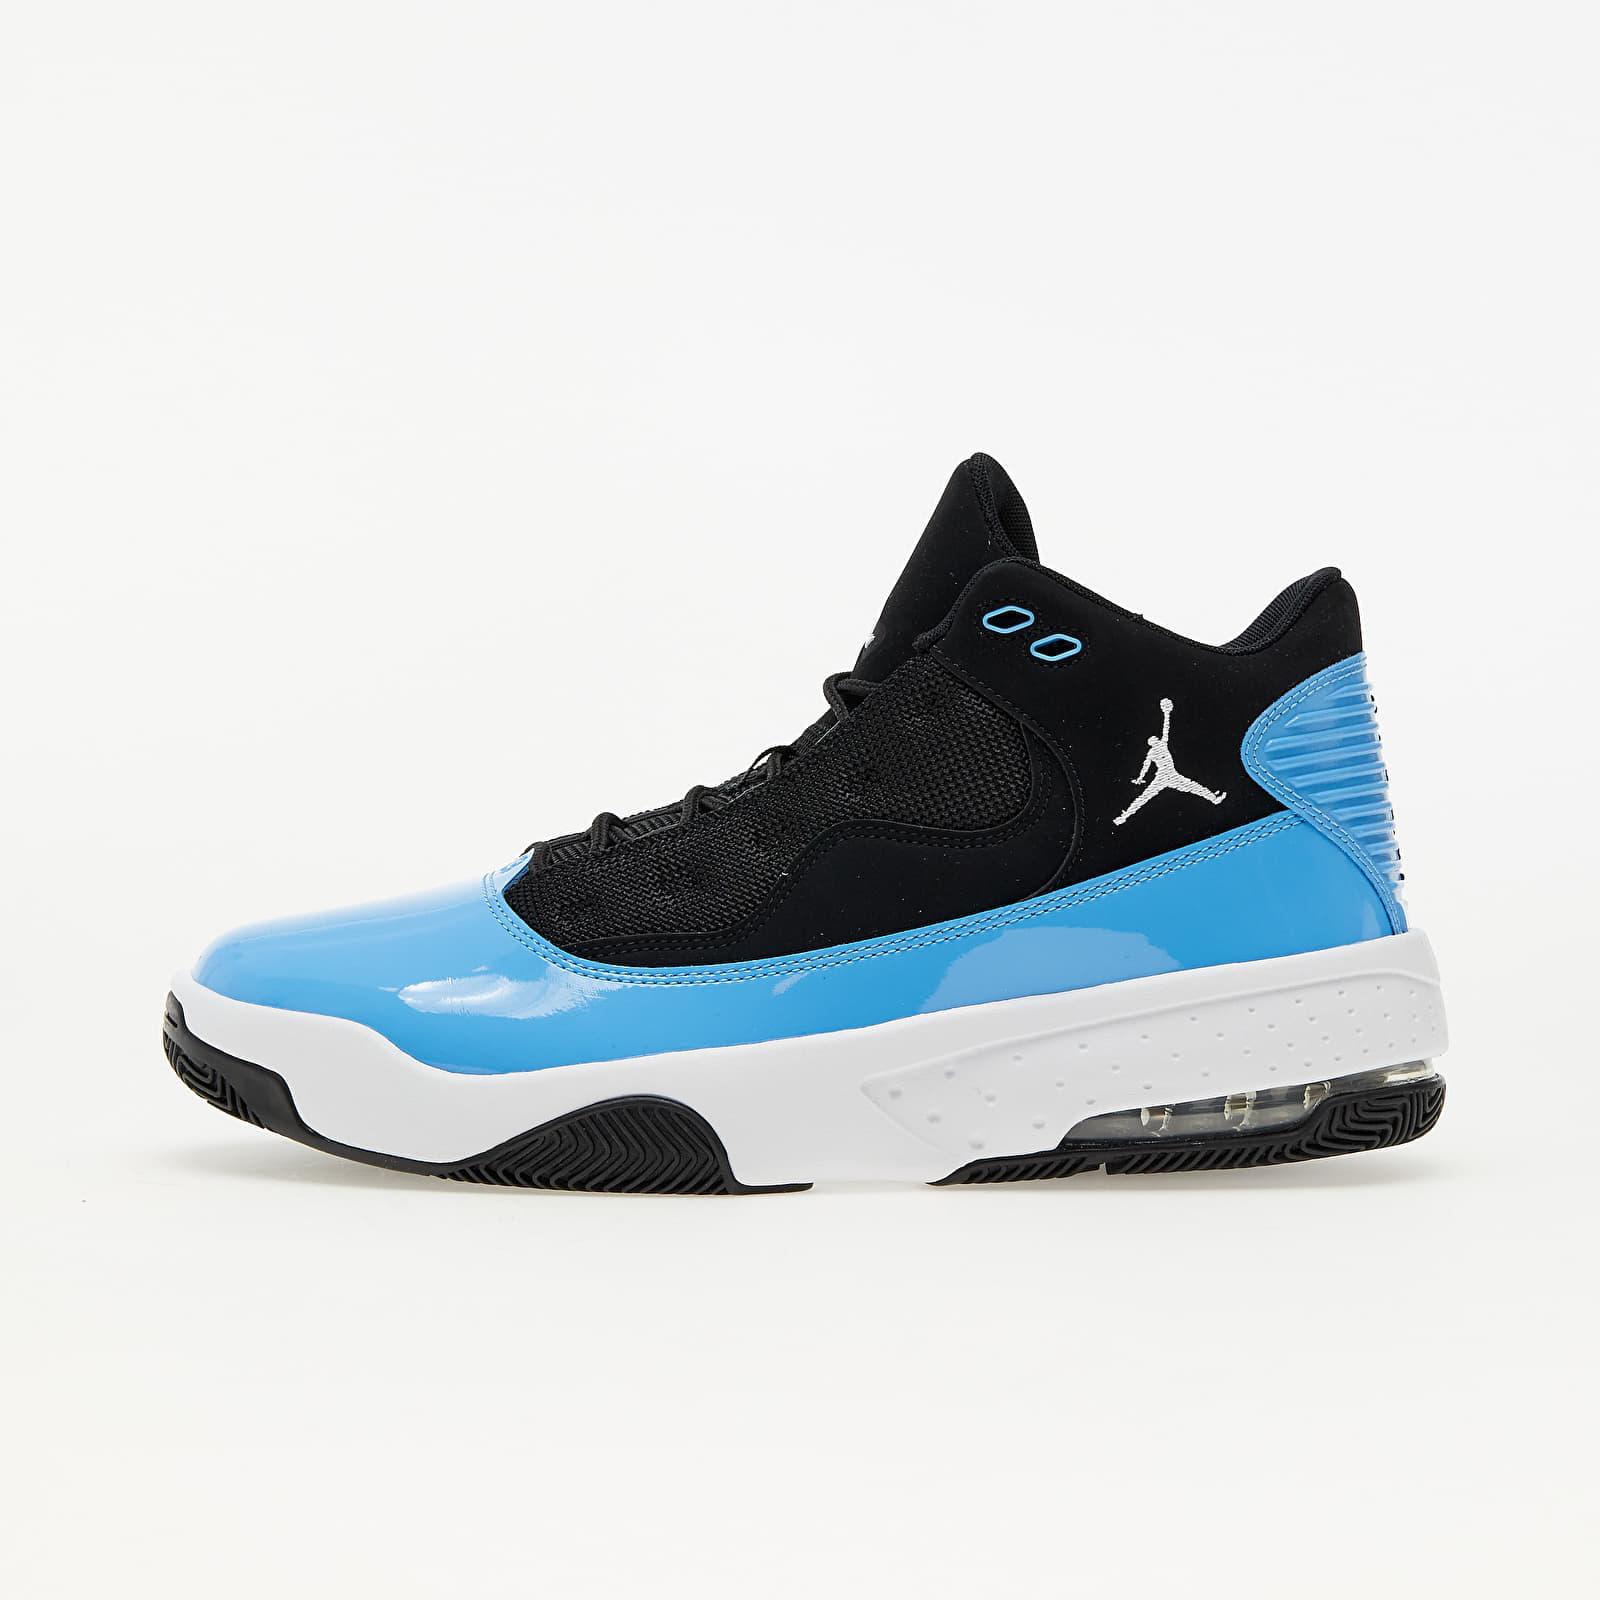 Jordan Max Aura 2 Black/ White-University Blue CK6636-041